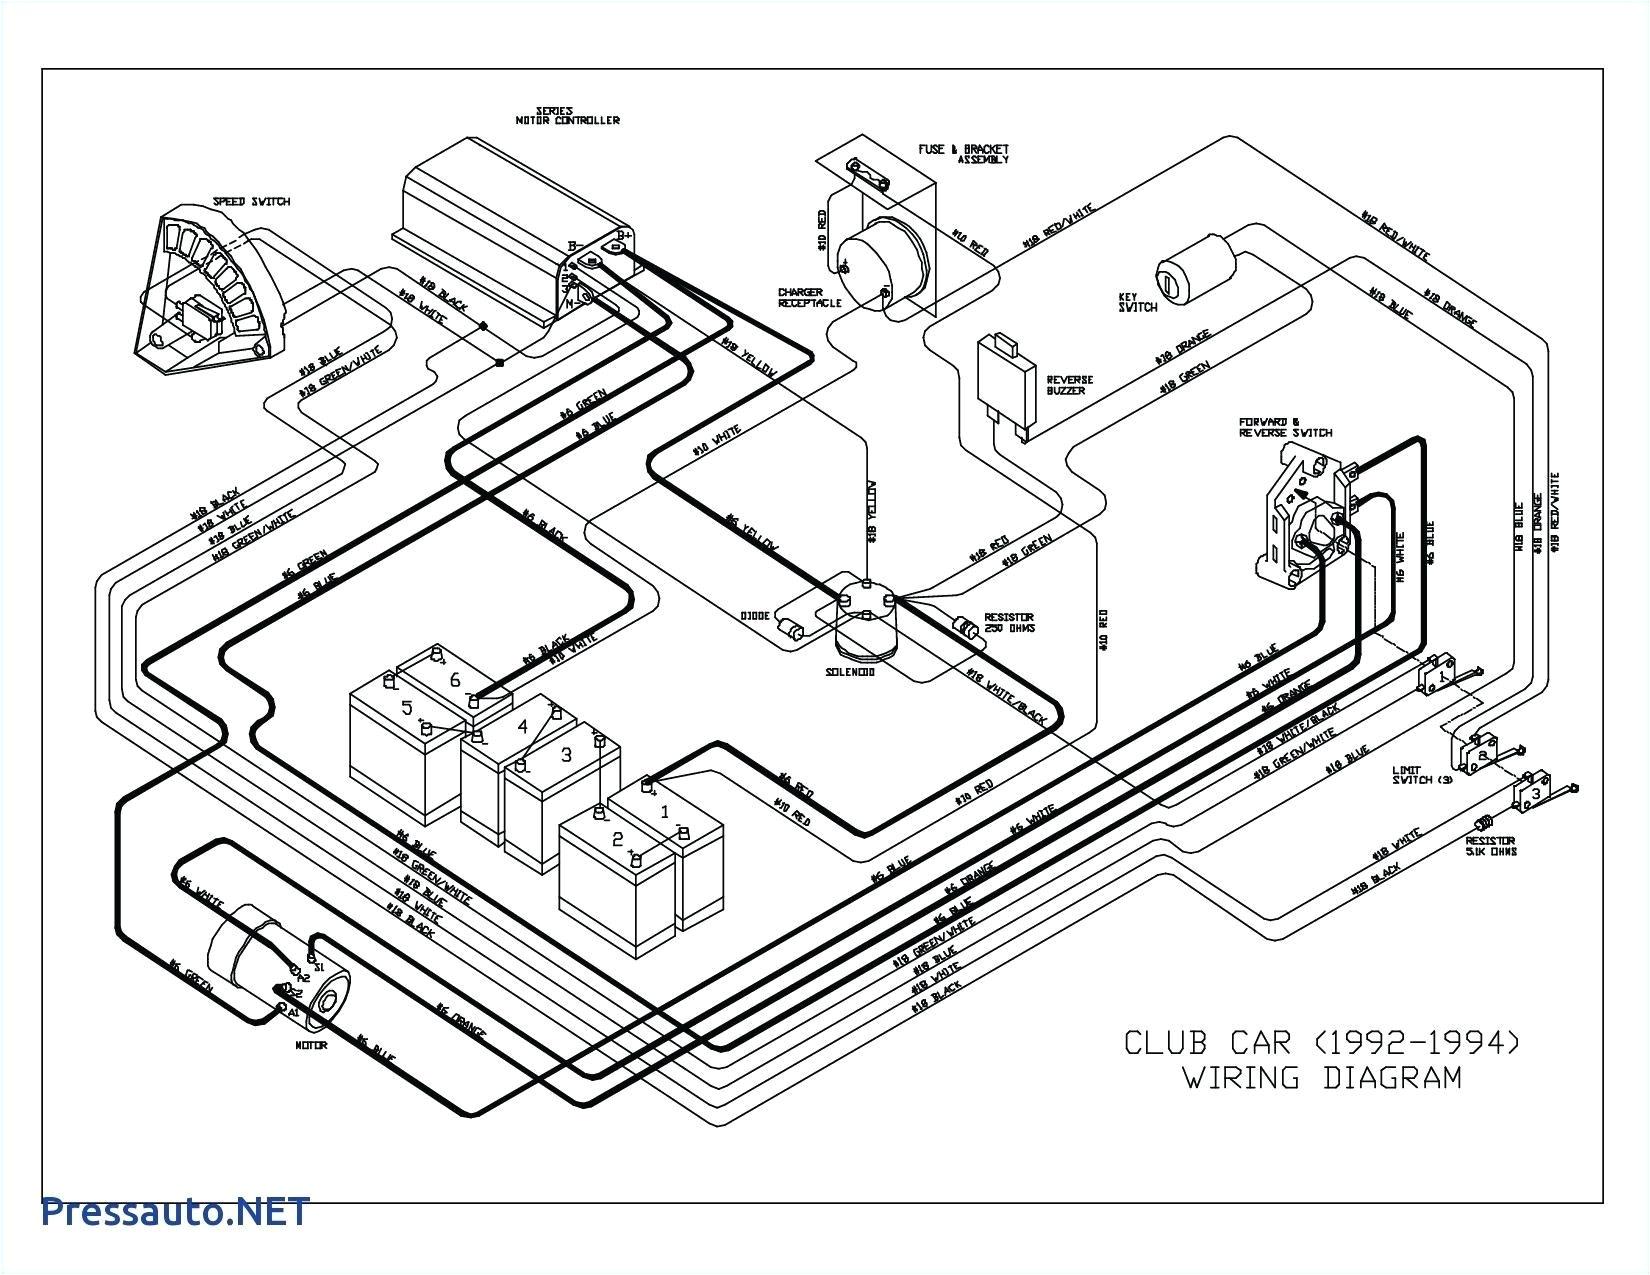 1996 ezgo txt battery diagram wiring diagram show ezgo 36 volt battery diagram ezgo circuit diagrams source electric ezgo golf cart